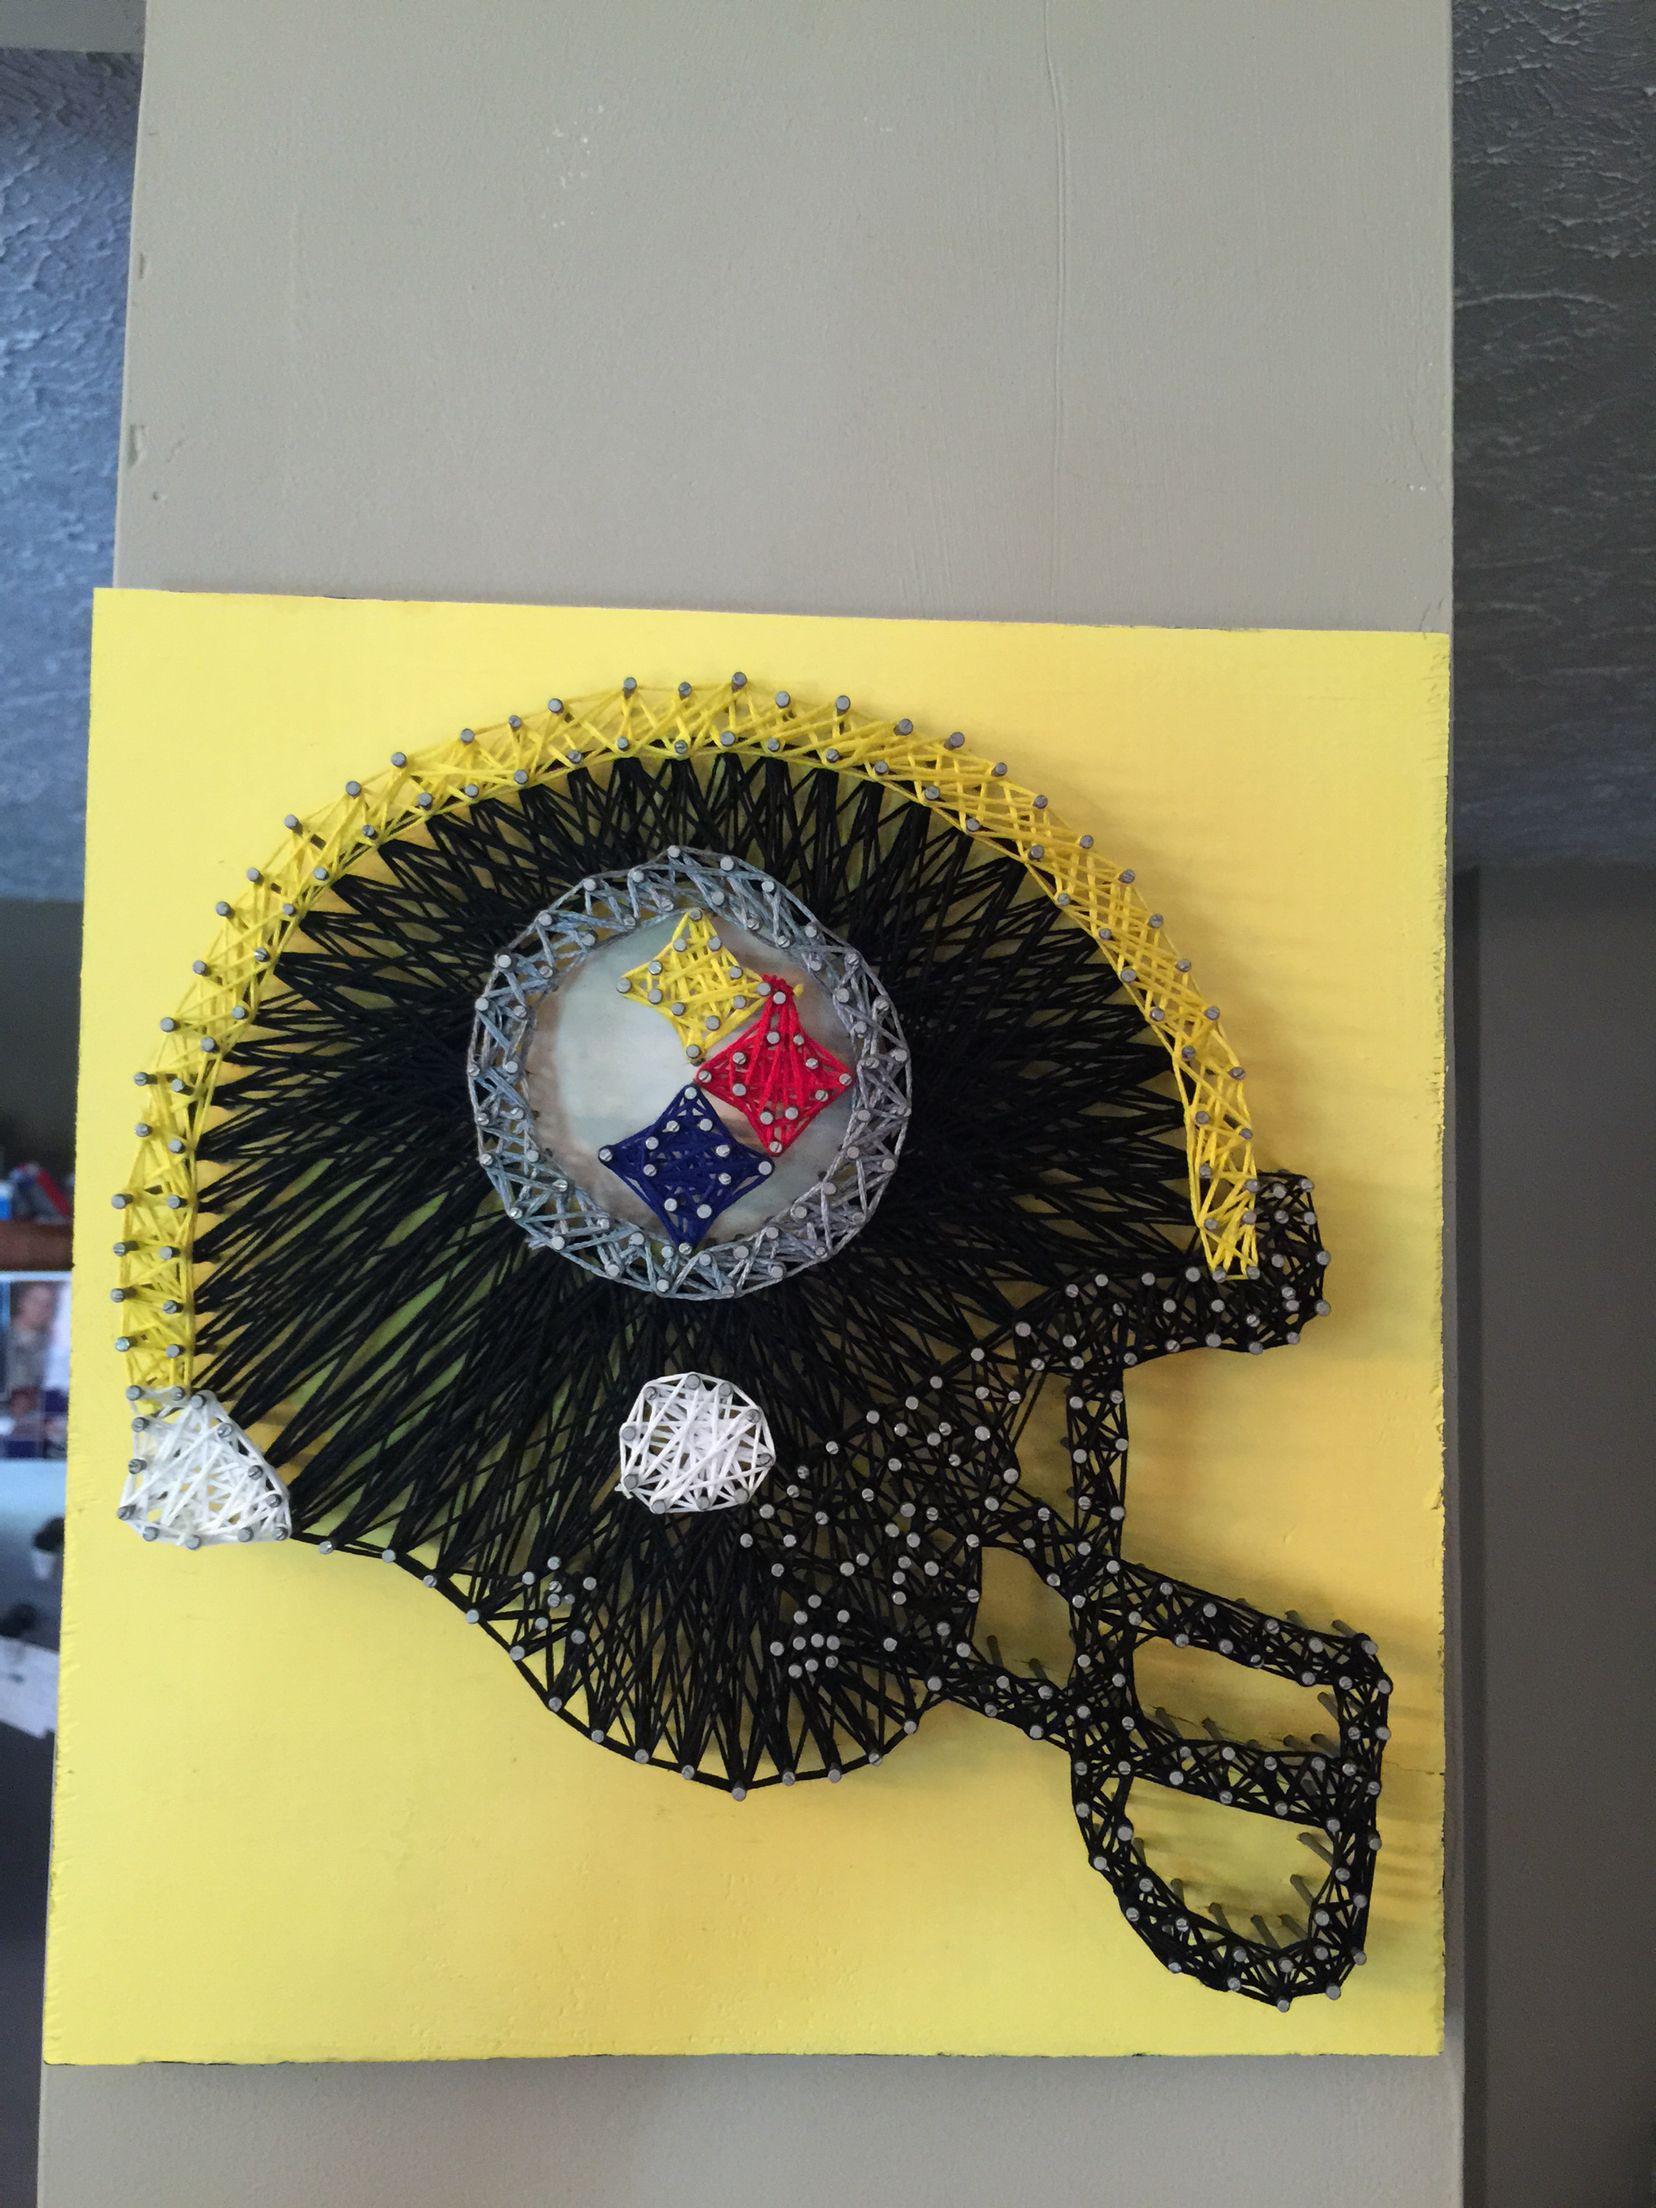 Steelers nail and string art | cute steeler stuff | Pinterest ...